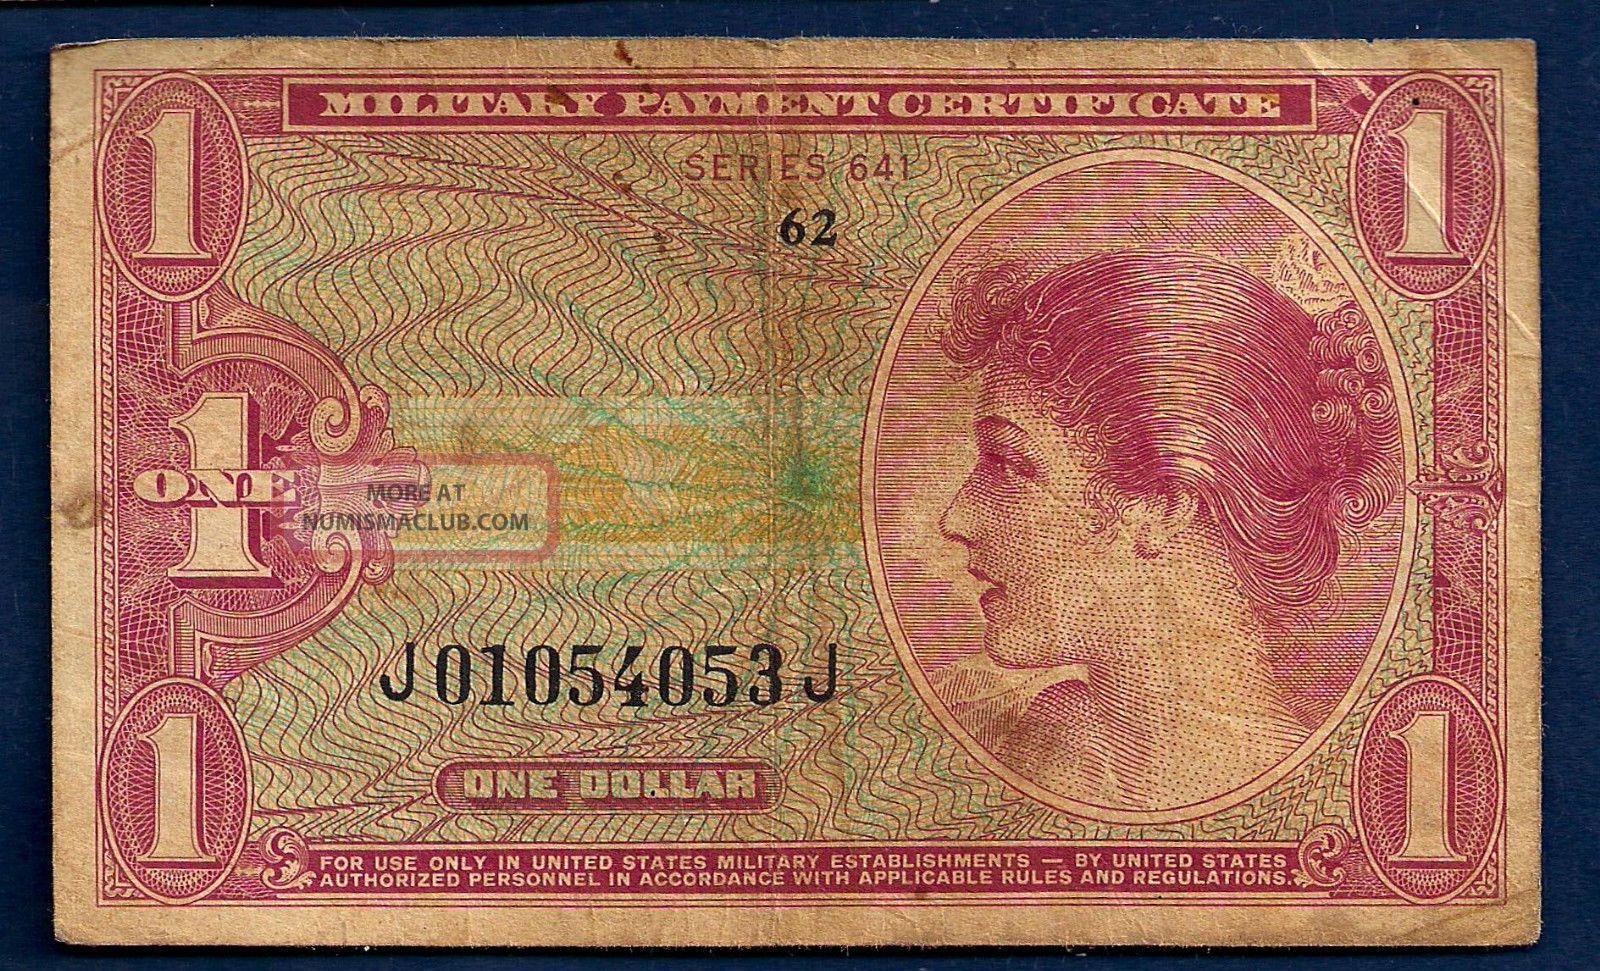 Us Military Payment $1 Dollar Nd - 1965 M61 Series 641 Vietnam War Era Certificate Paper Money: US photo